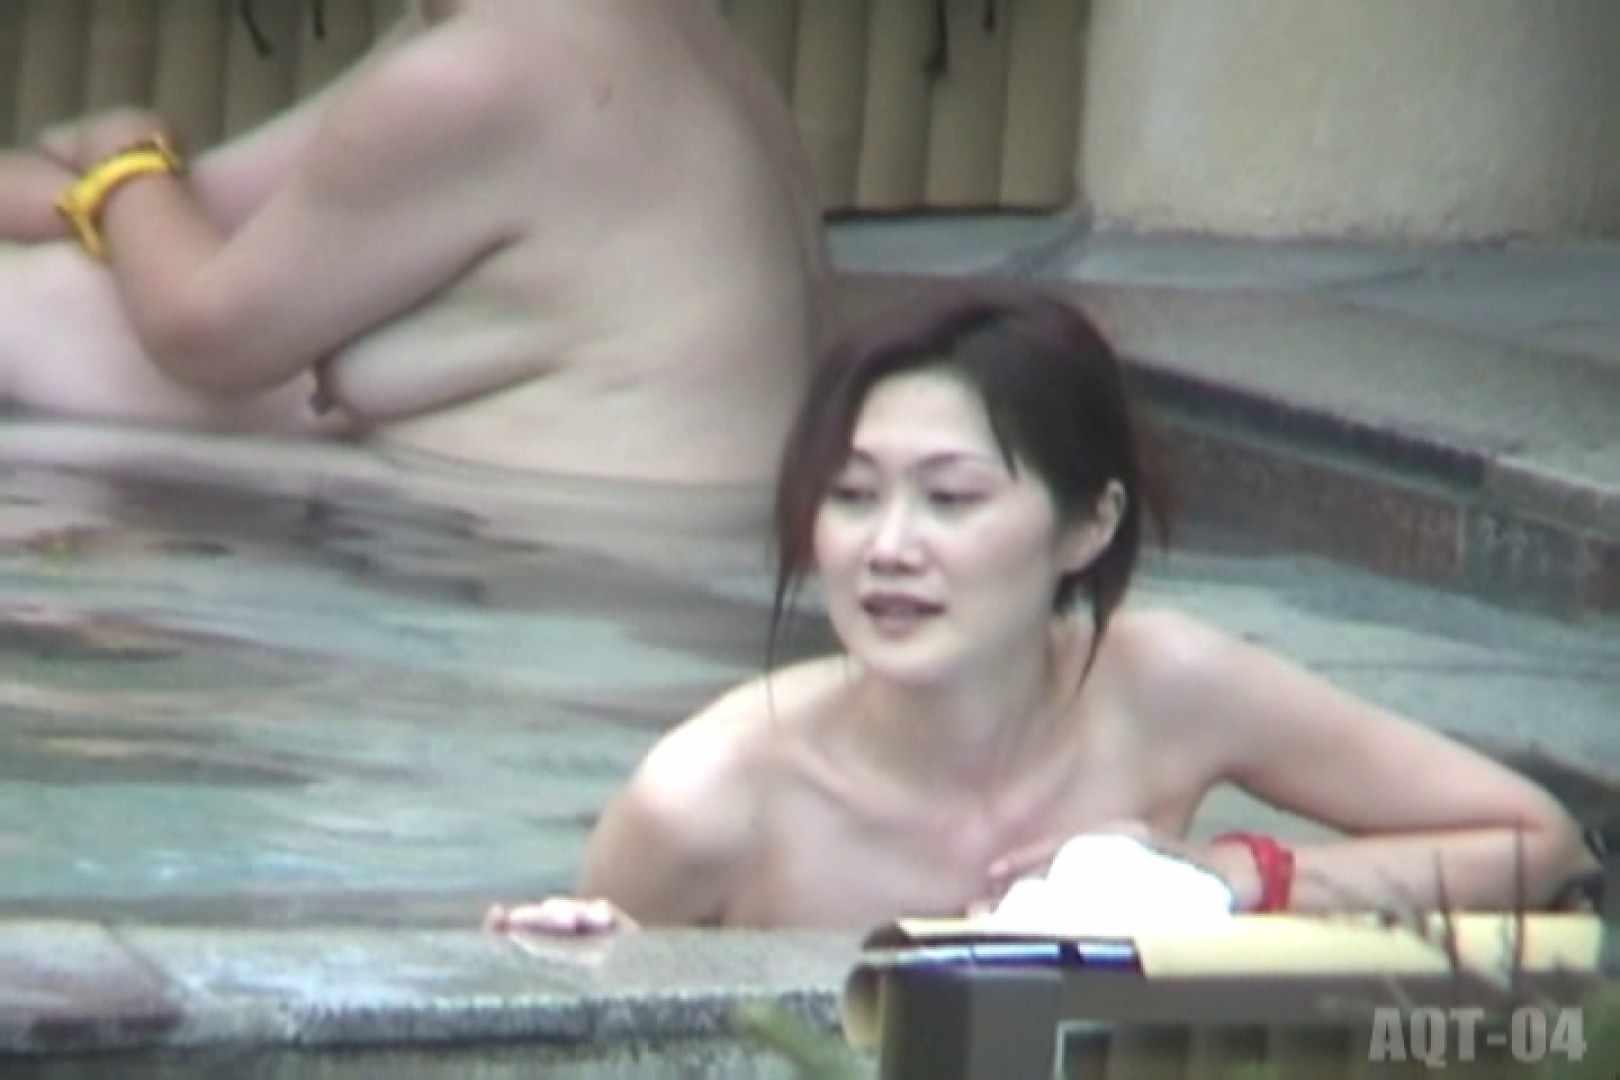 Aquaな露天風呂Vol.739 露天風呂突入 | 盗撮師作品  88pic 79